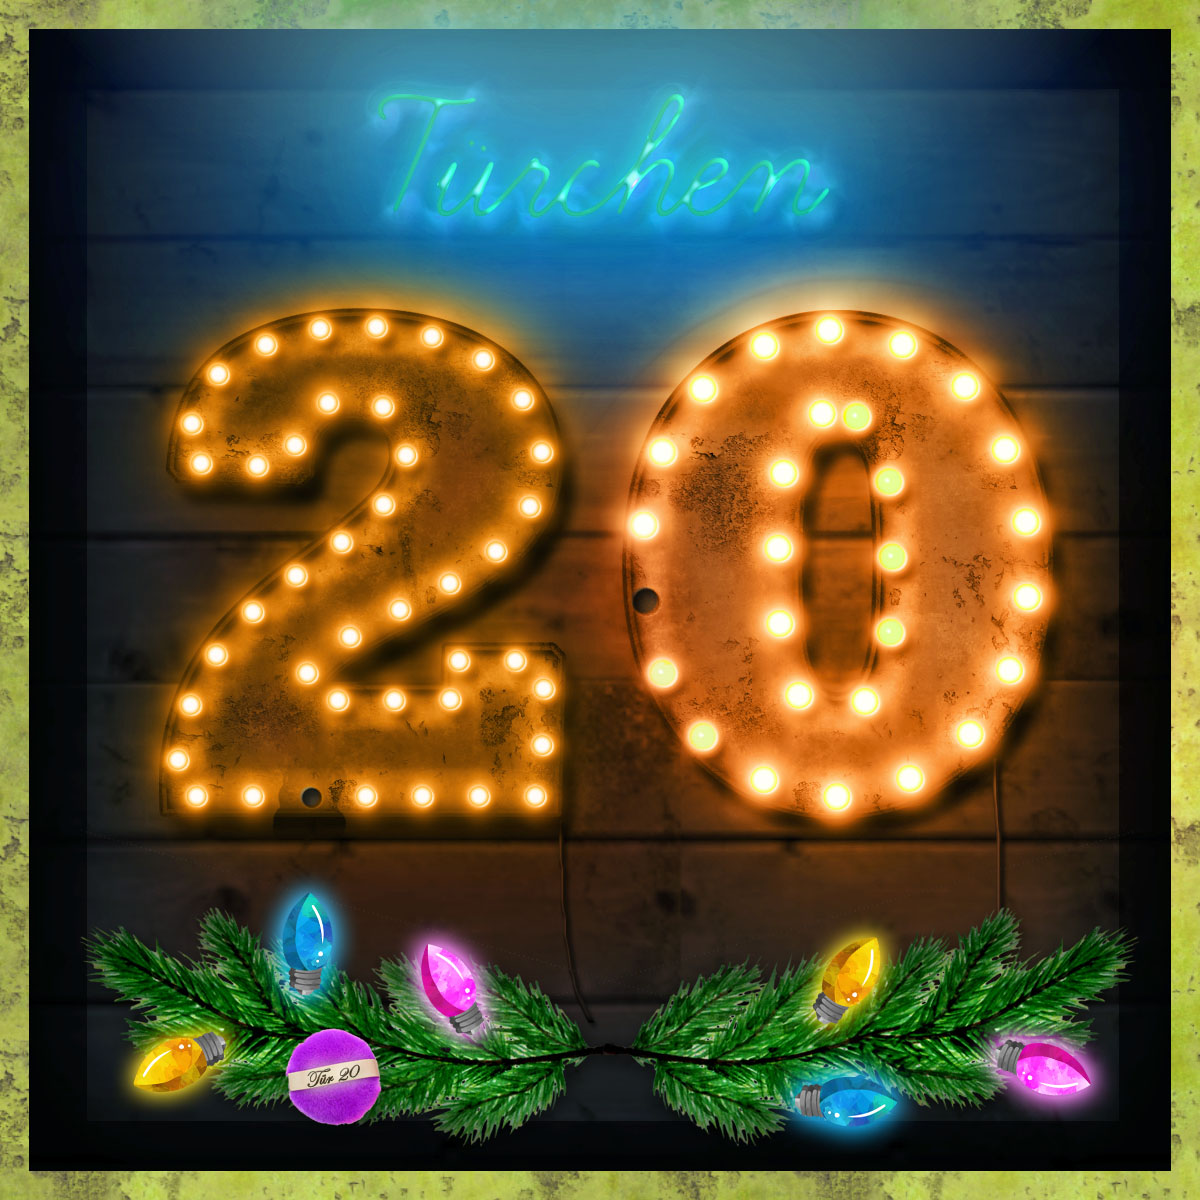 Tür 20 des MAGIMANIA Adventskalenders 2017